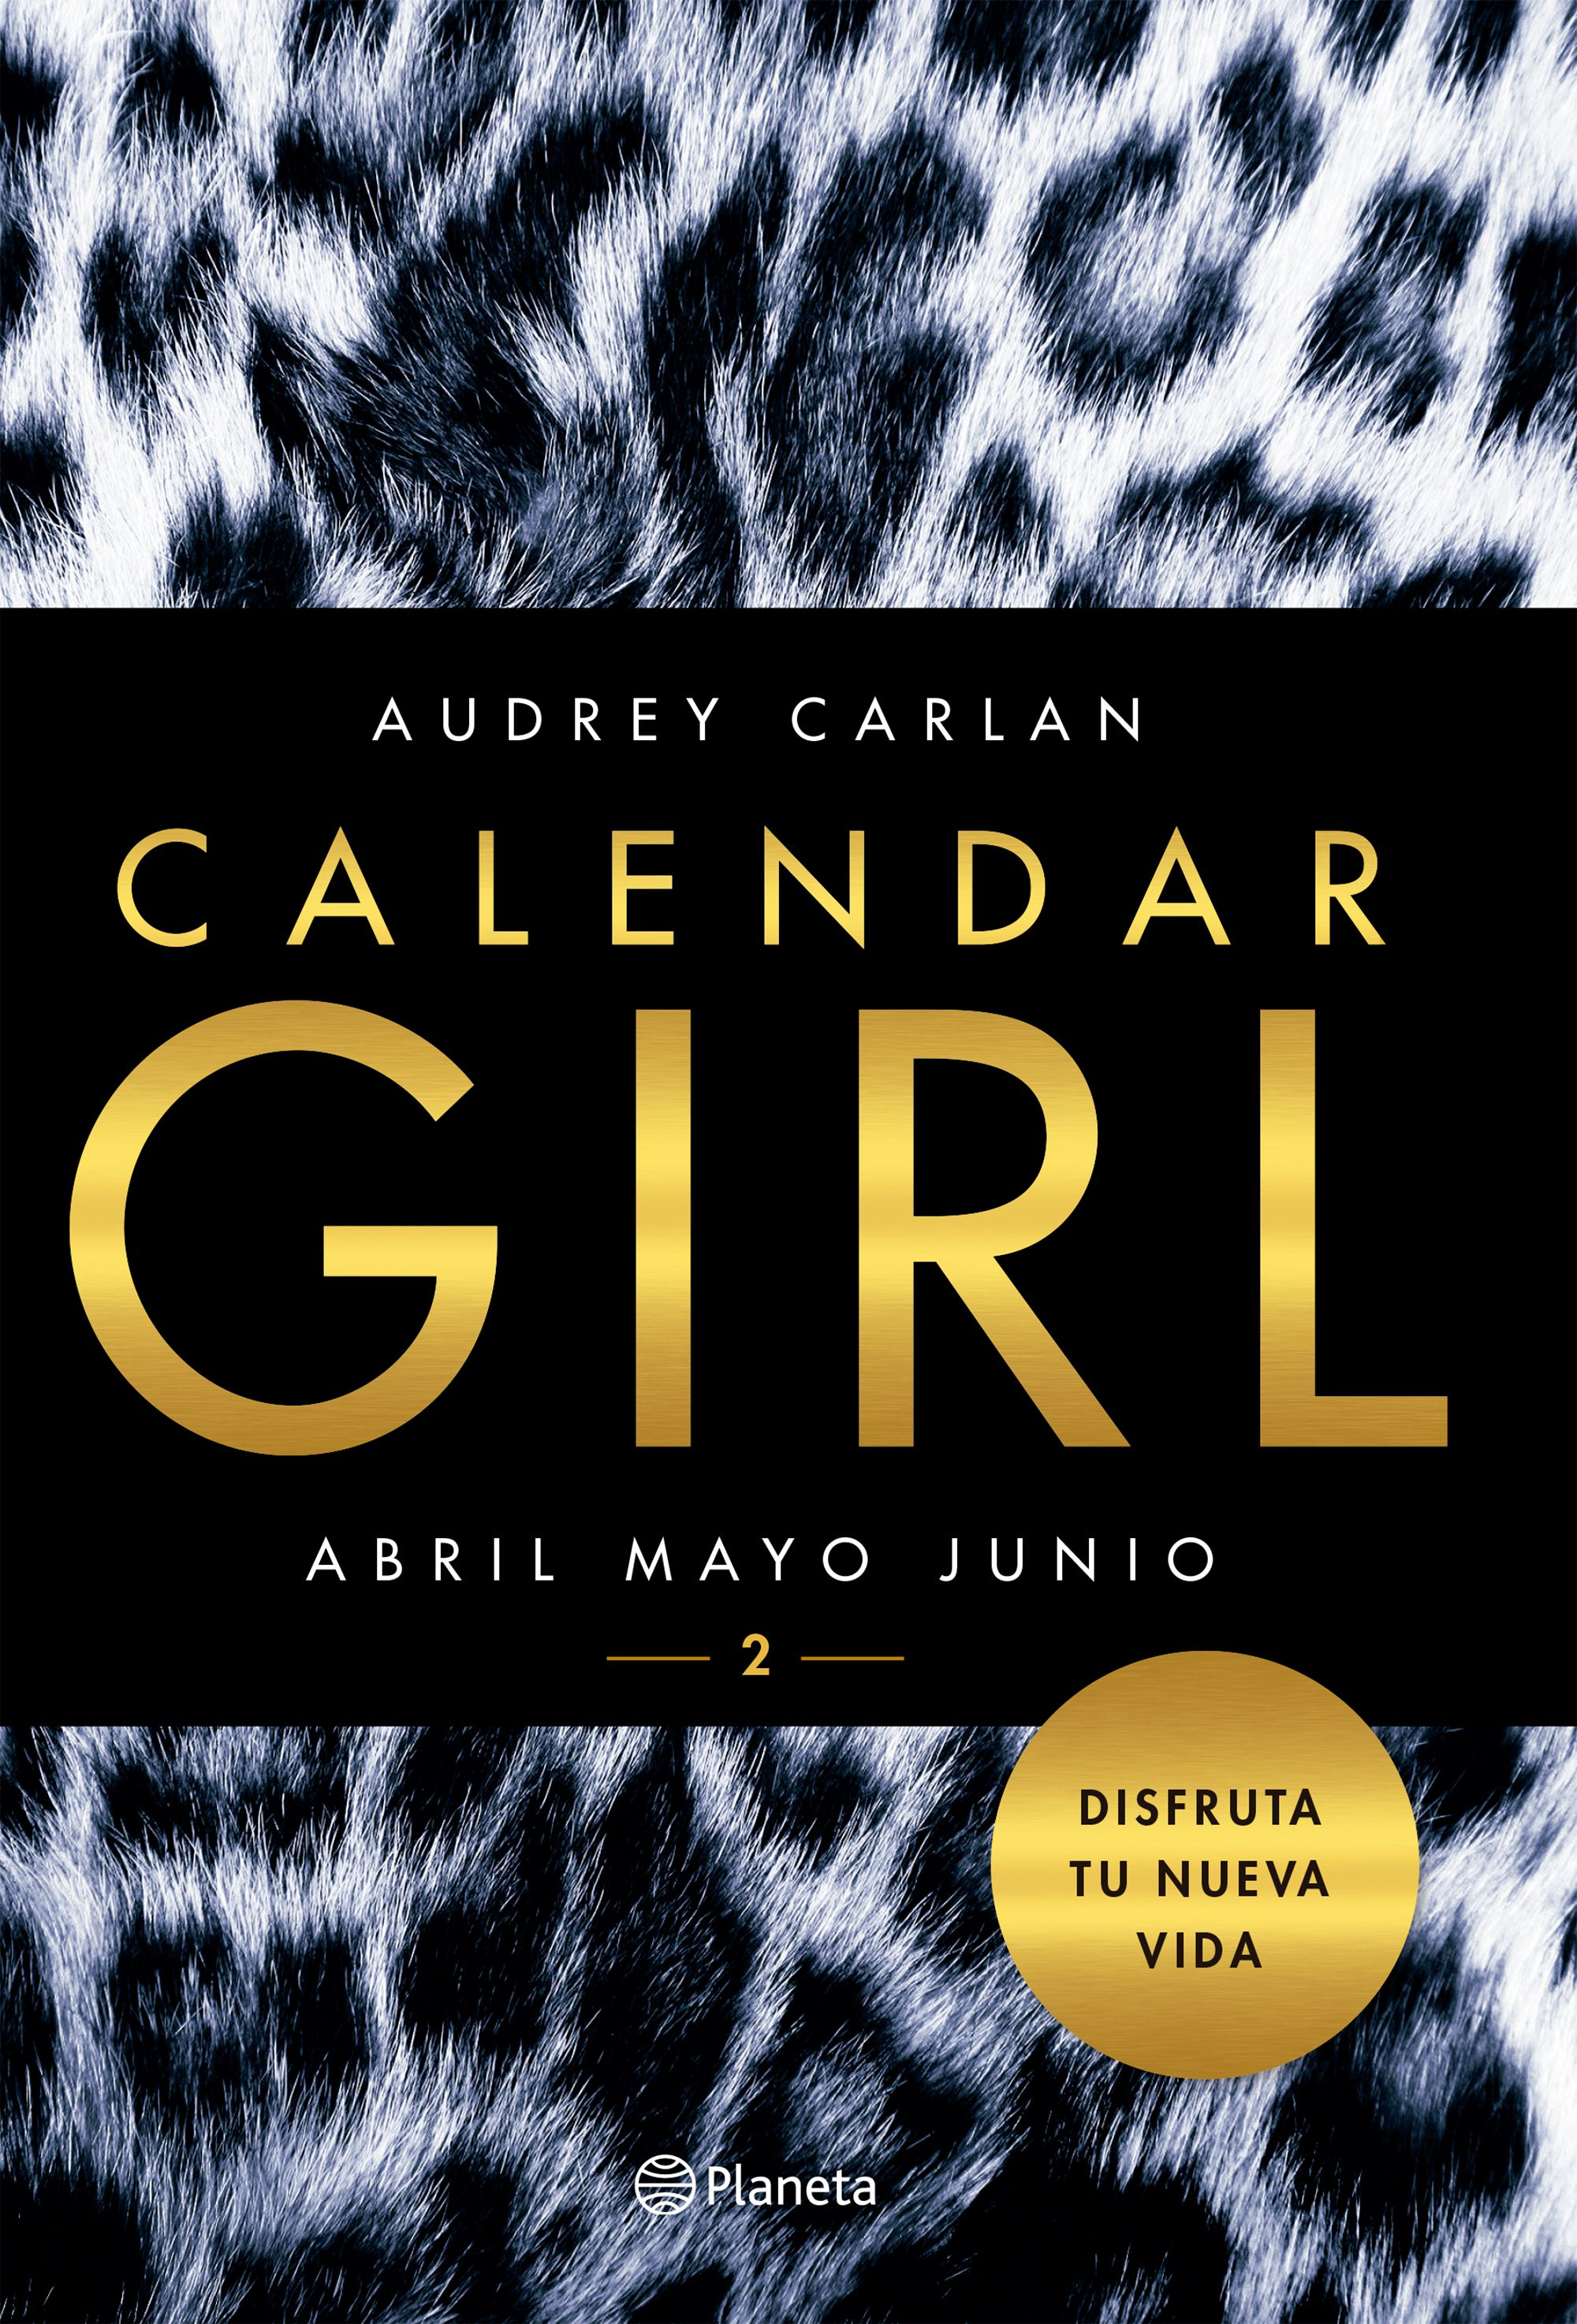 Calendar Girl 2 (Abril, Mayo, Junio) - Audrey Carlan - Planeta